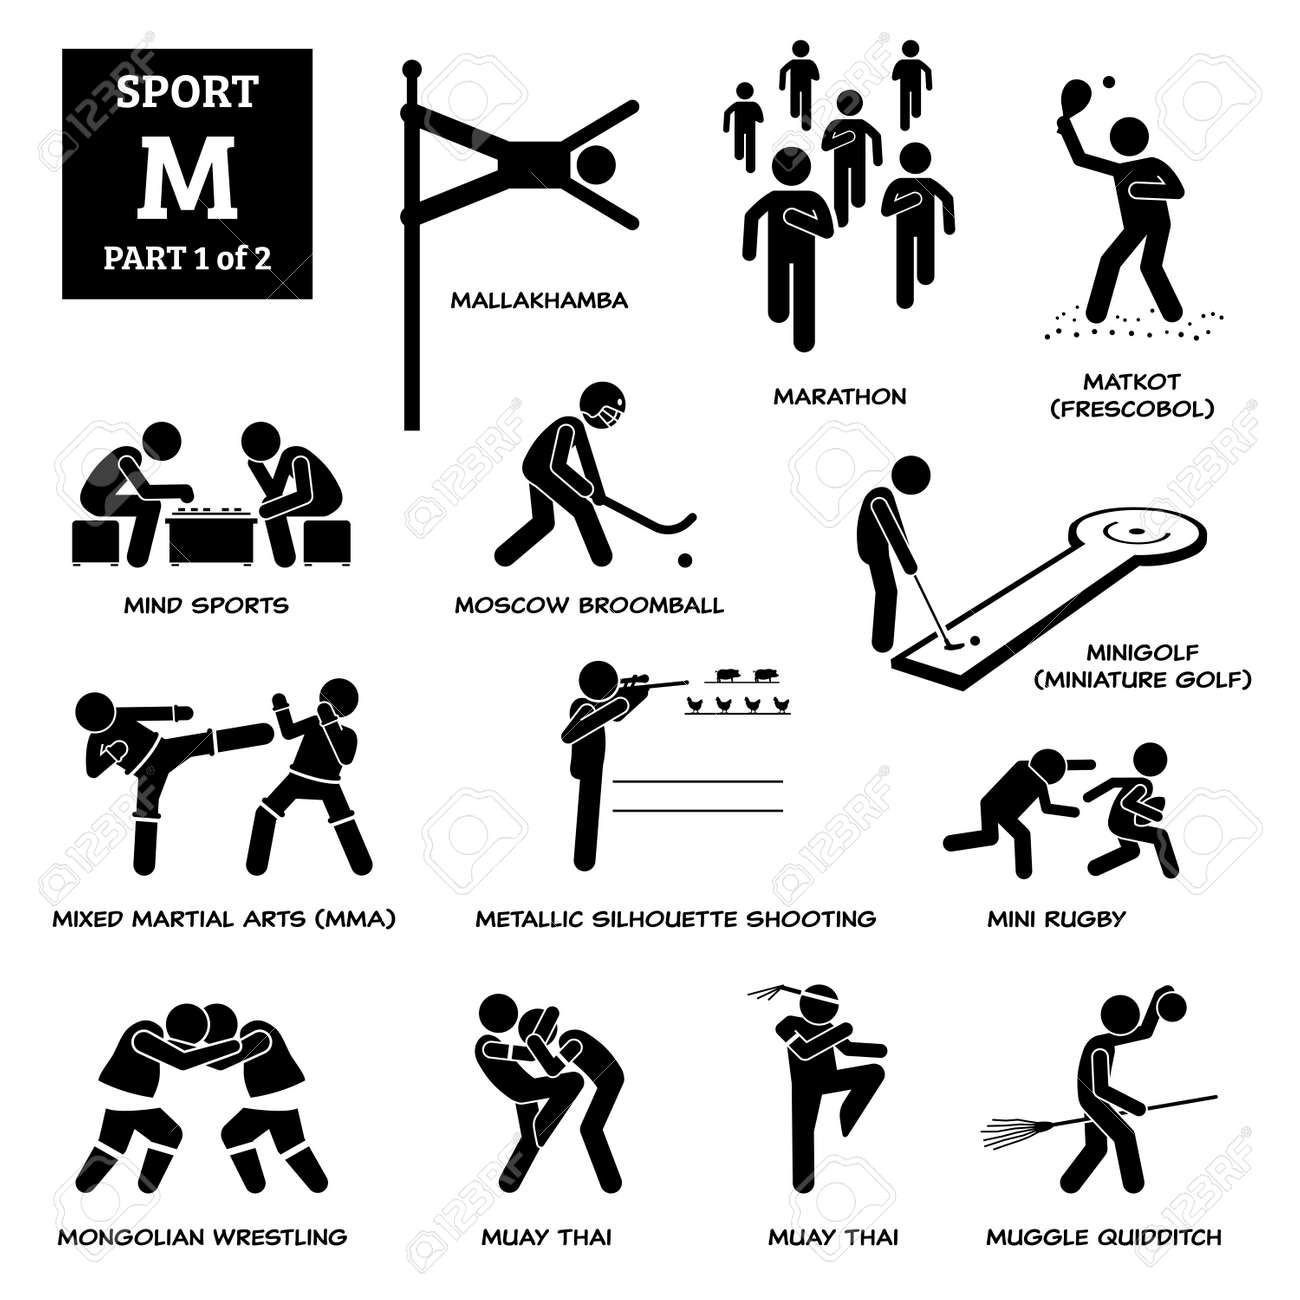 Sport games alphabet M vector icons pictogram. Mallakhamba, marathon, matkot, frescobol, mind sports, Moscow broomball, mini golf, miniature golf, MMA, mini rugby, muay thai, and metallic shooting. - 172367786